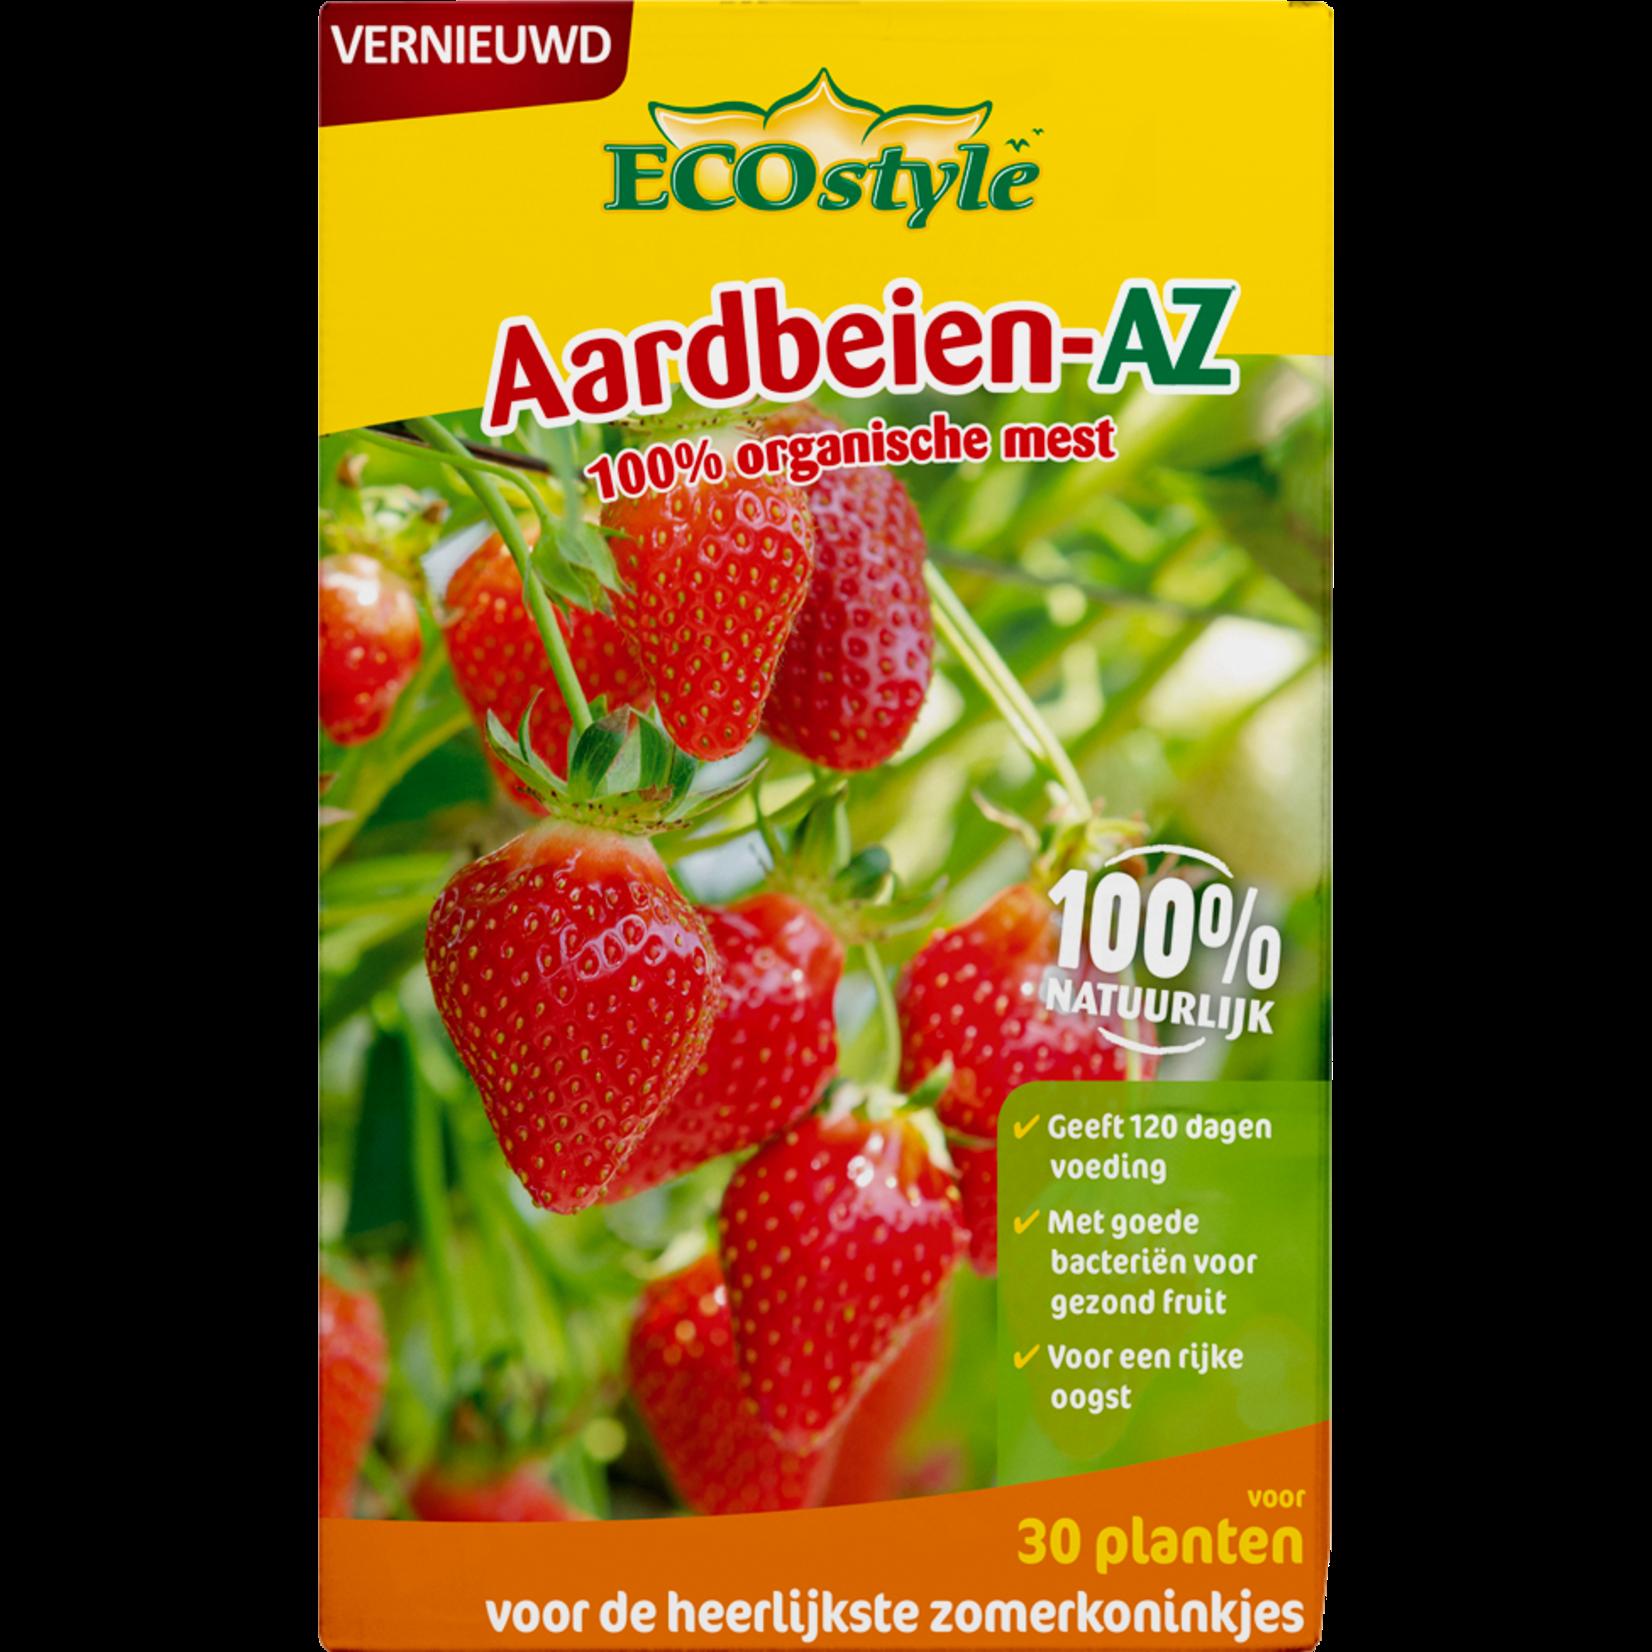 Ecostyle ECOSTYLE Aardbeien-az 1 kg